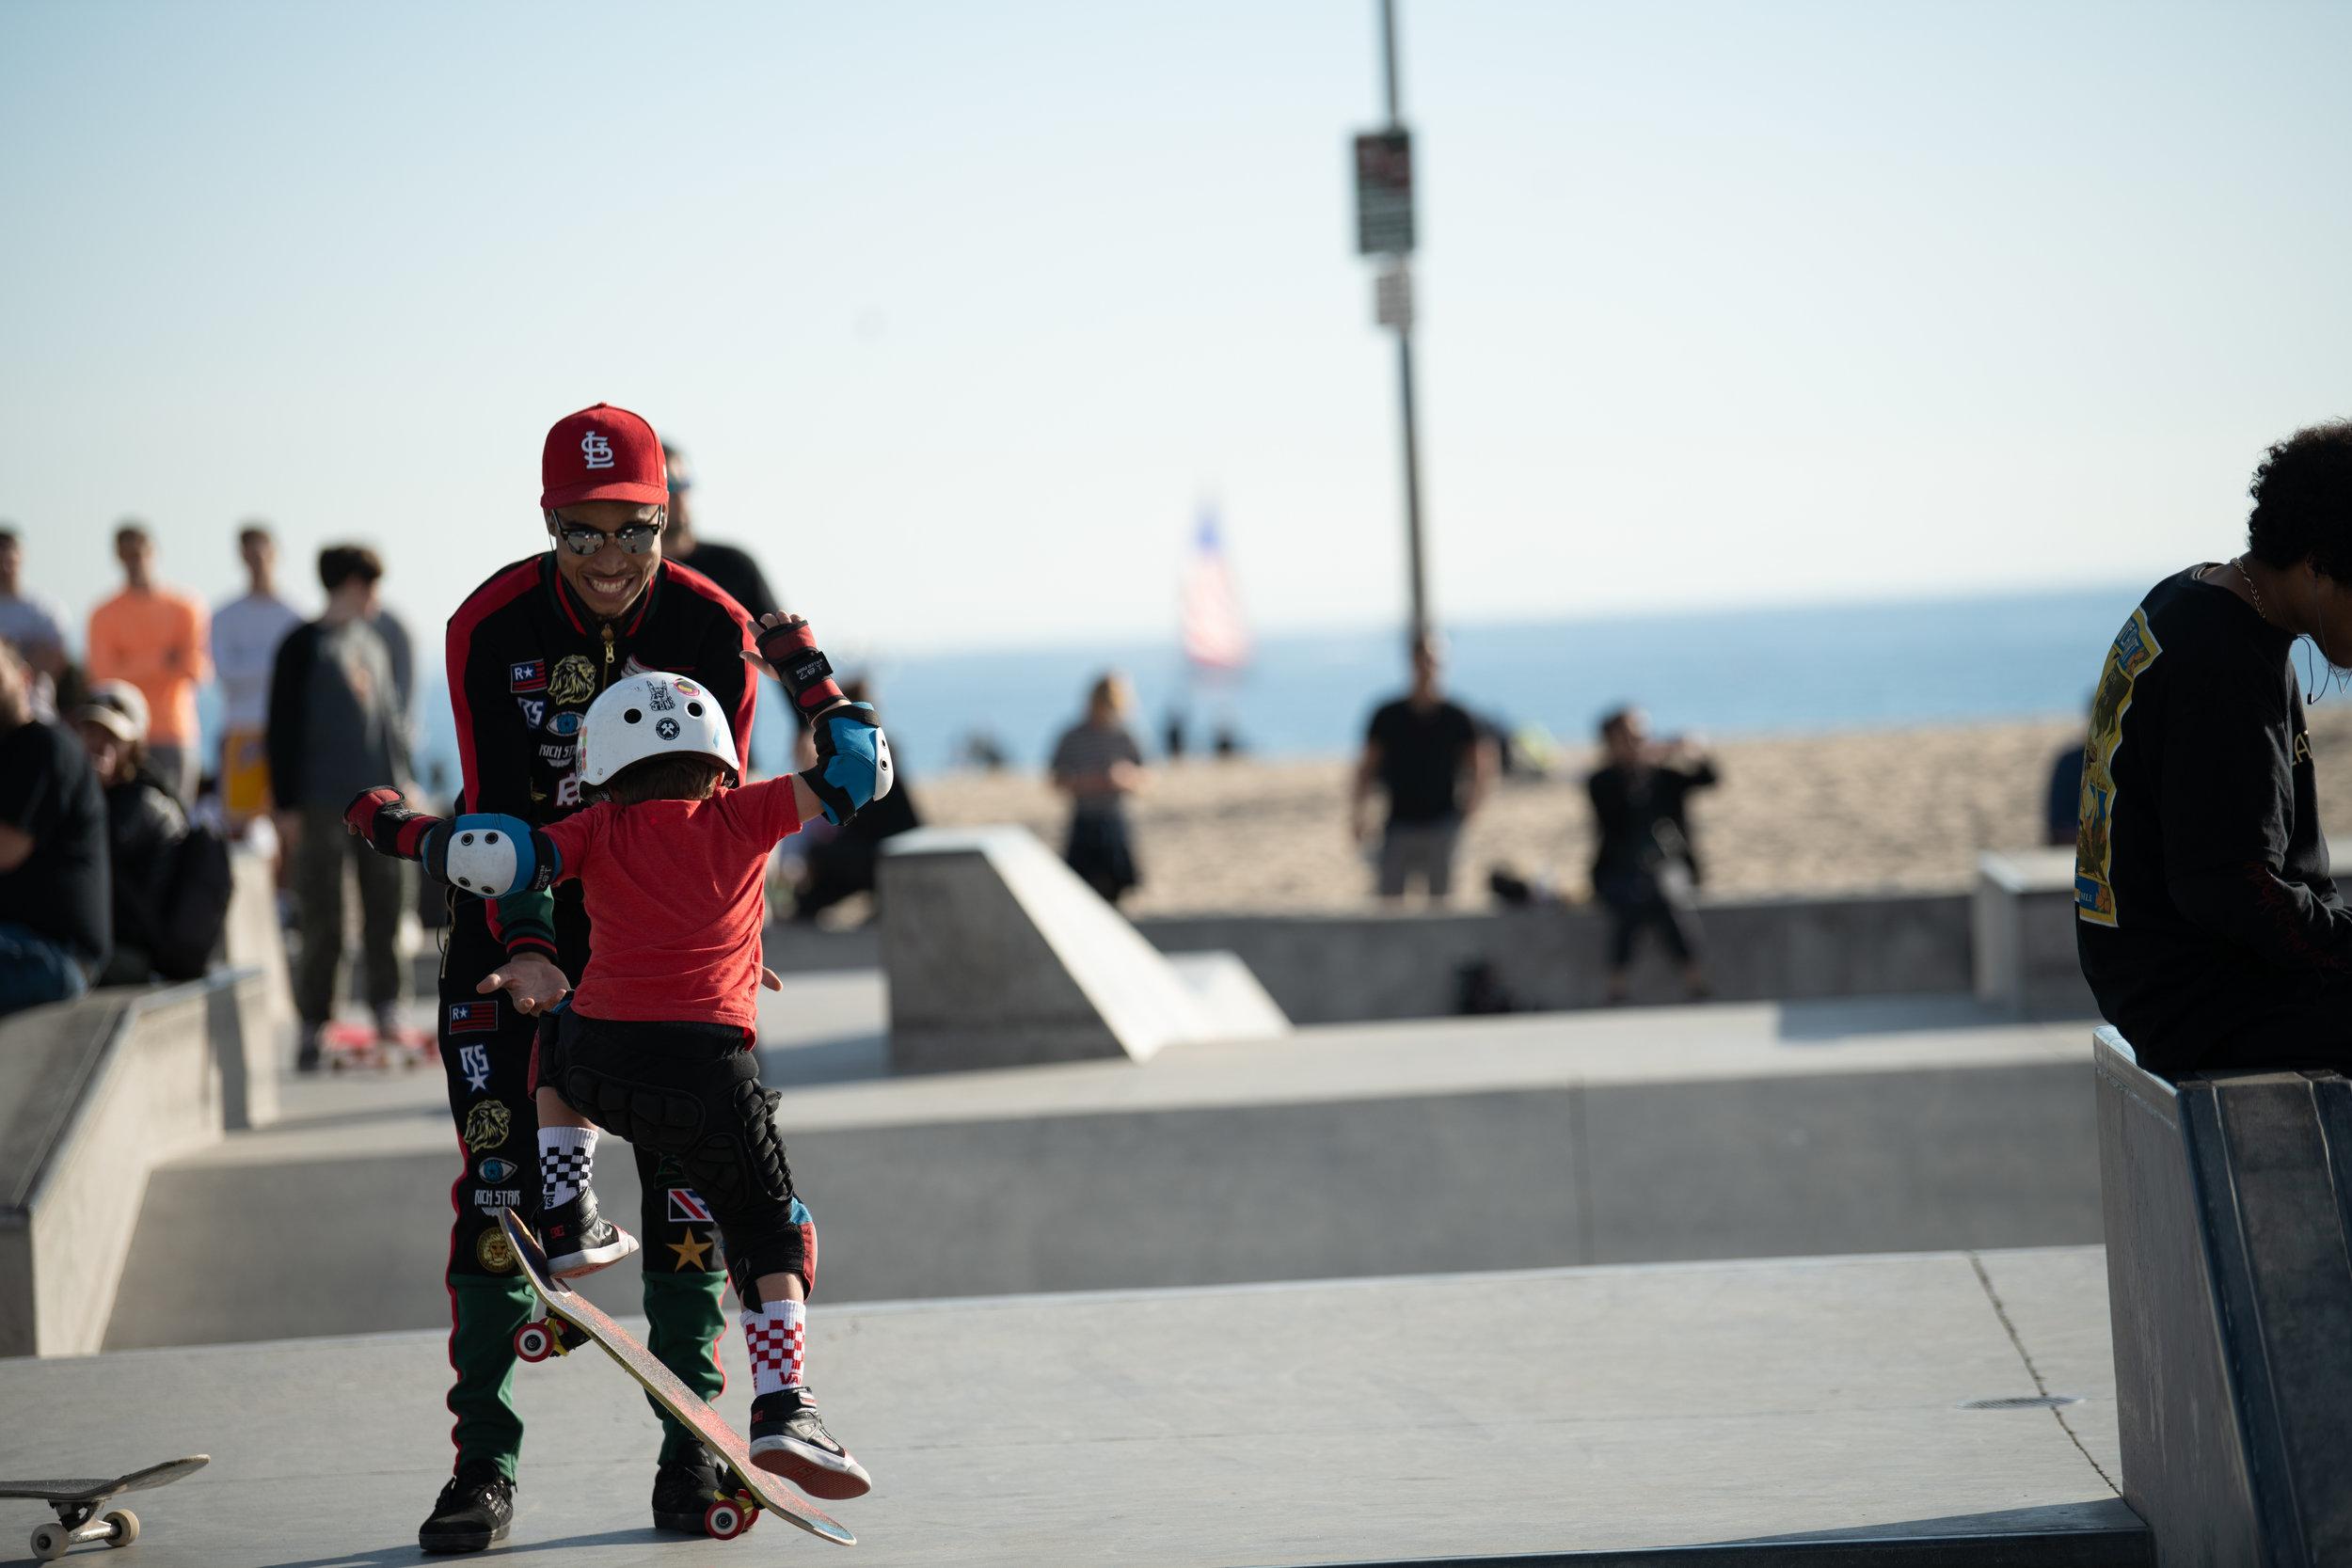 Venice Beach Skateboarders-10.jpg